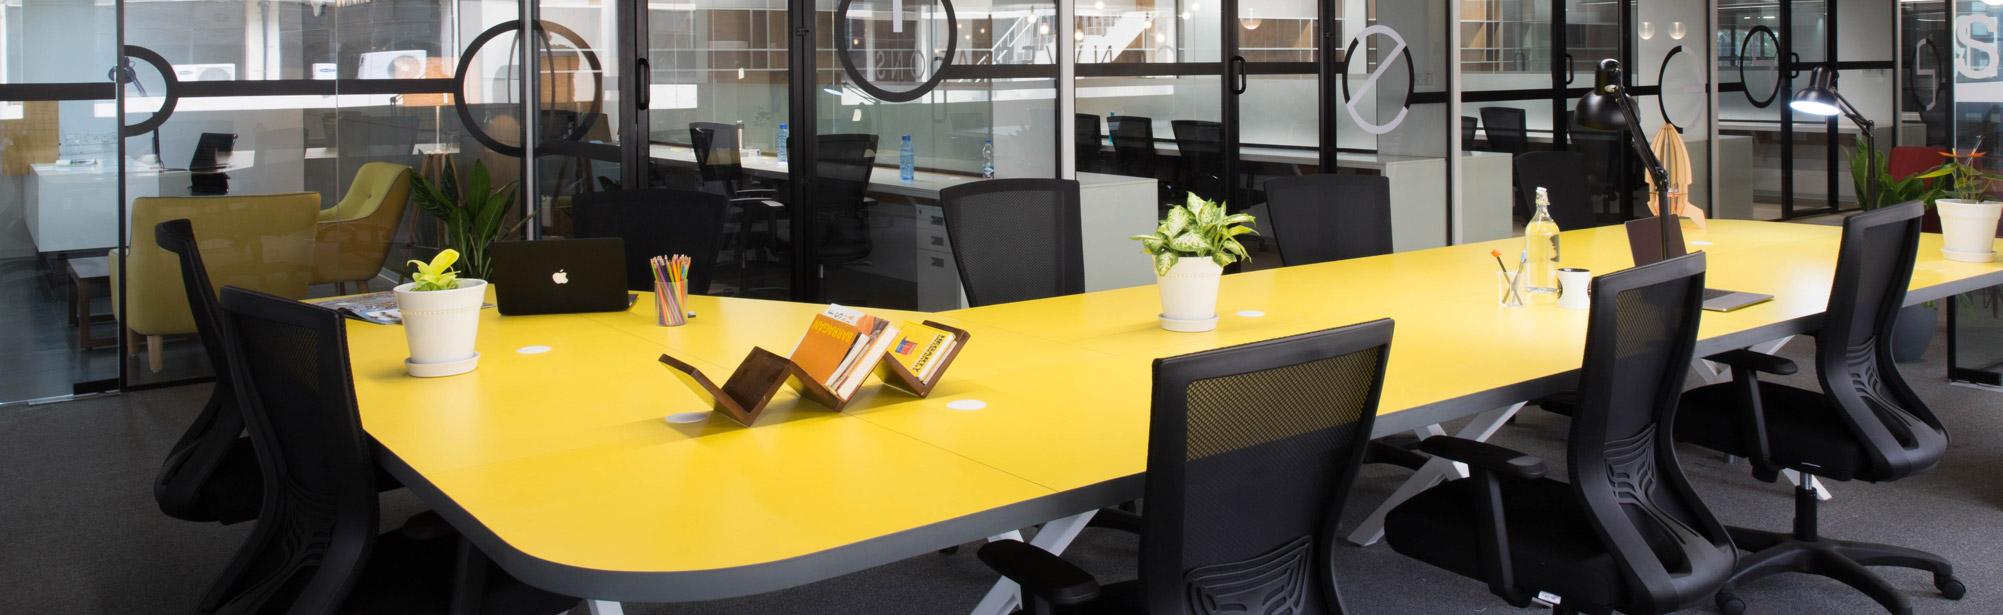 Coworking Office Spaces Varthur